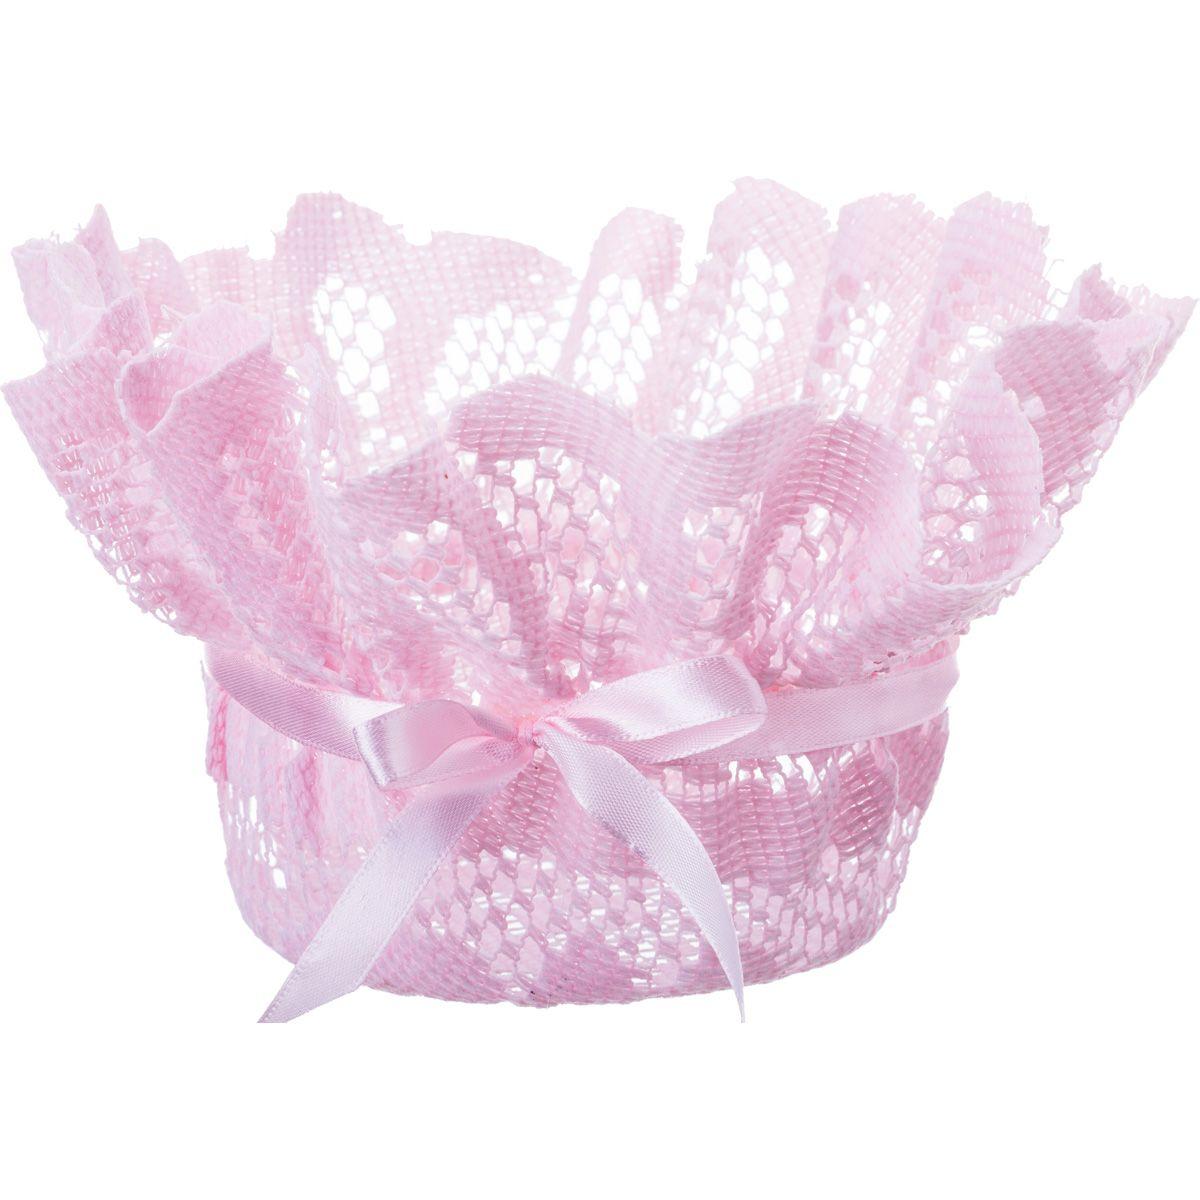 Корзины, коробки и контейнеры Lefard Корзинка Zebulon Цвет: Розовый (18 см) lefard салатник lotte 18 см